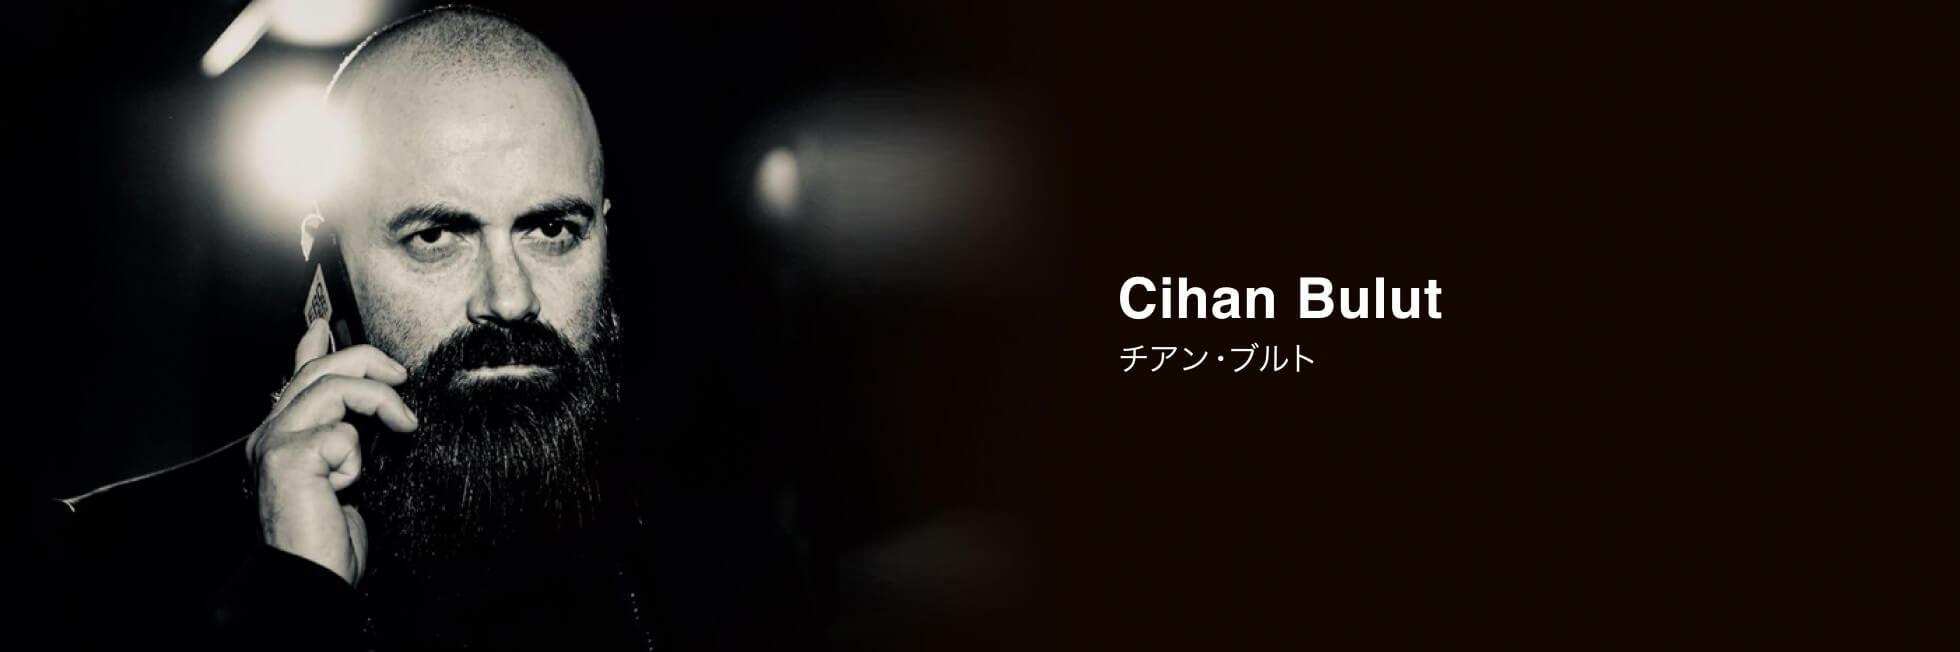 Cihan Bulut チアン・ブルト